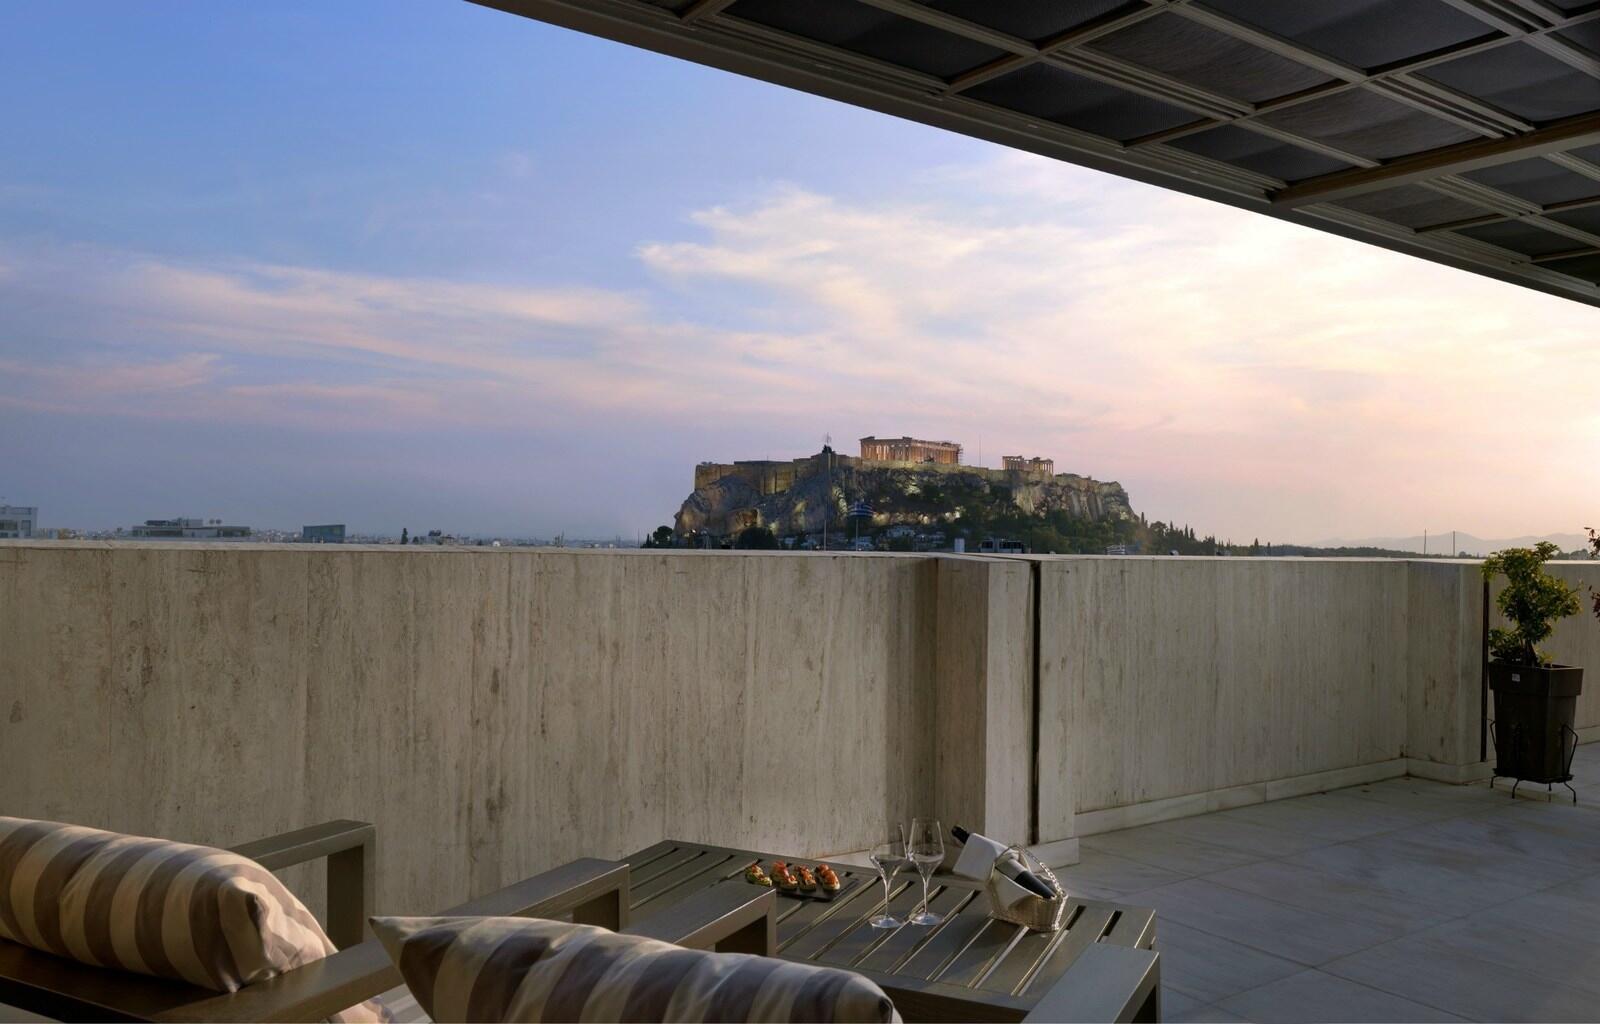 Al fresco restaurant with acropolis views at NJV Athens Plaza Ho